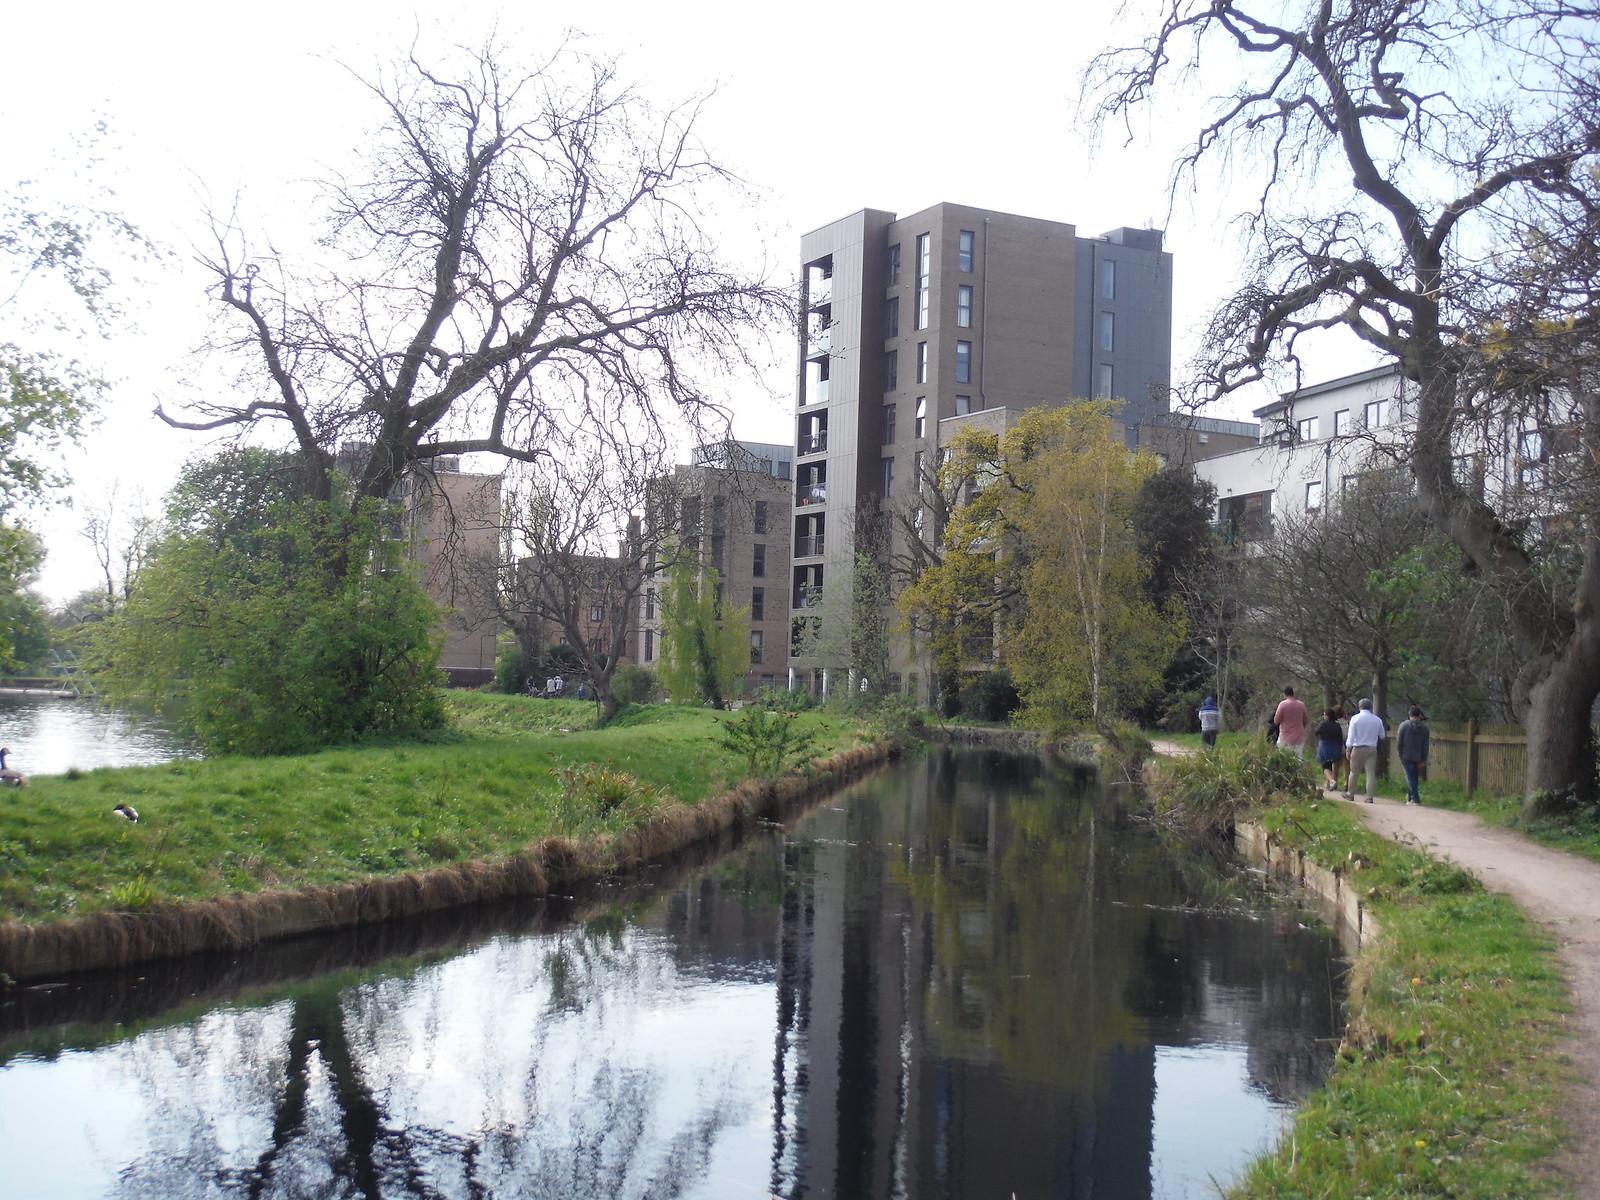 The New River, Stoke Newington SWC Short Walk 26 - Woodberry Wetlands (Stoke Newington Reservoirs)